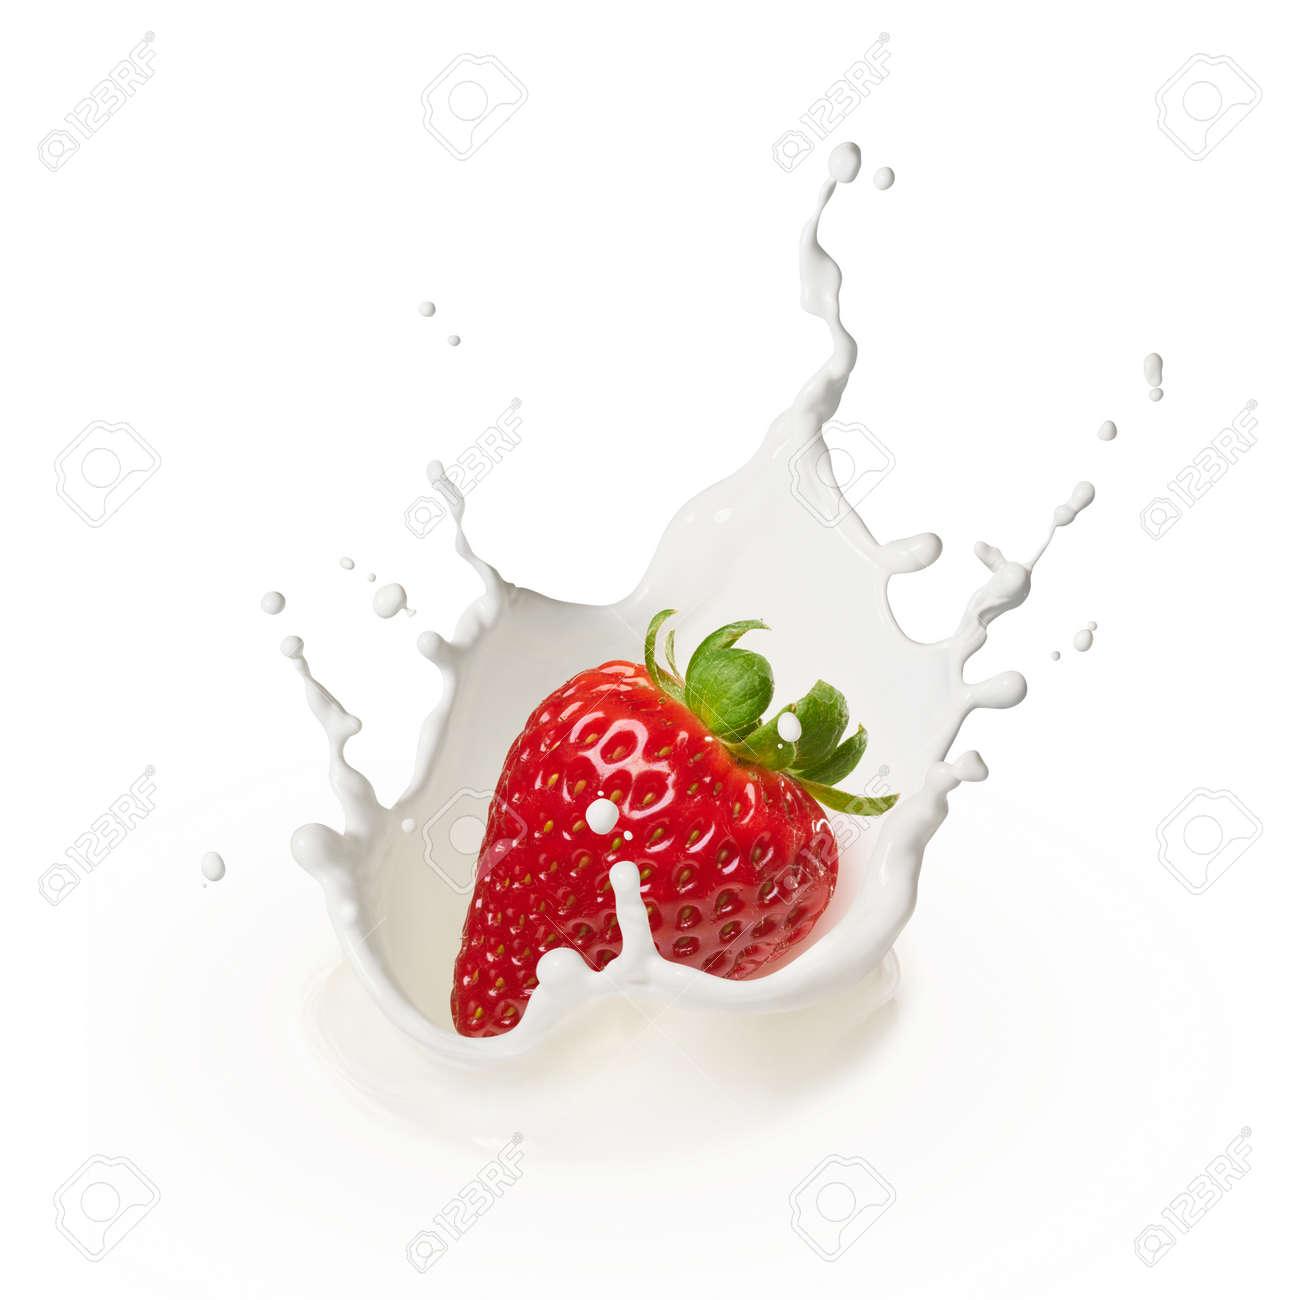 dropping a strawberry into milk causing splash - 38831324